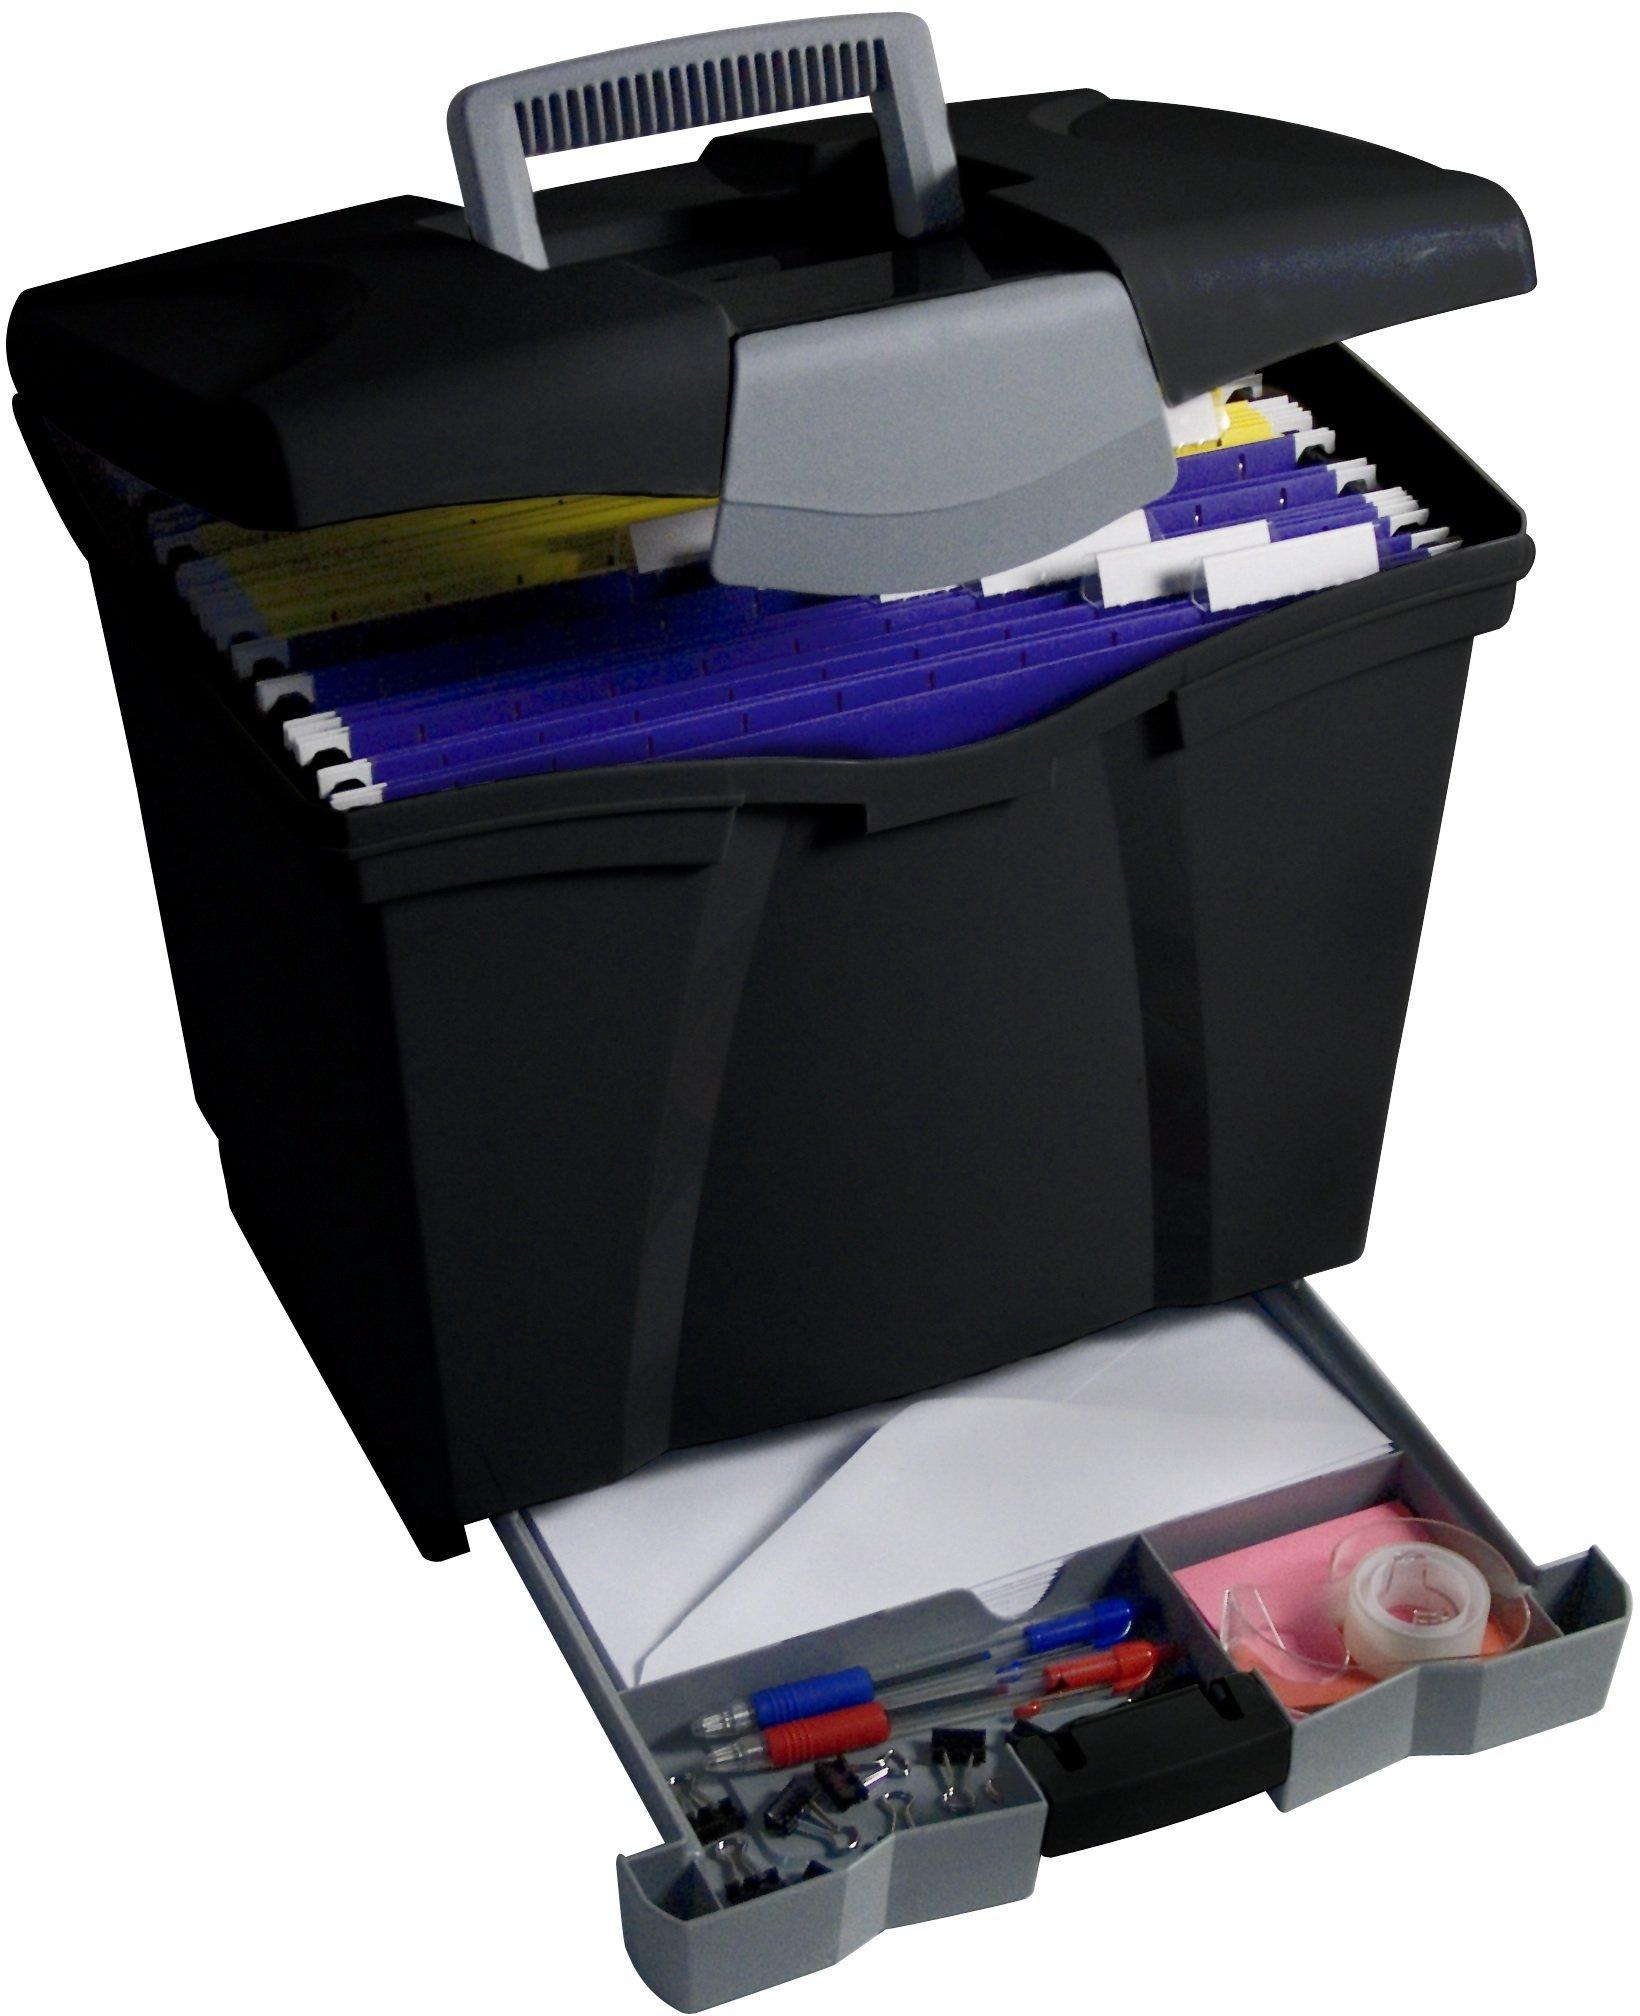 Storex Portable File Box with Drawer, Black (4 Set)